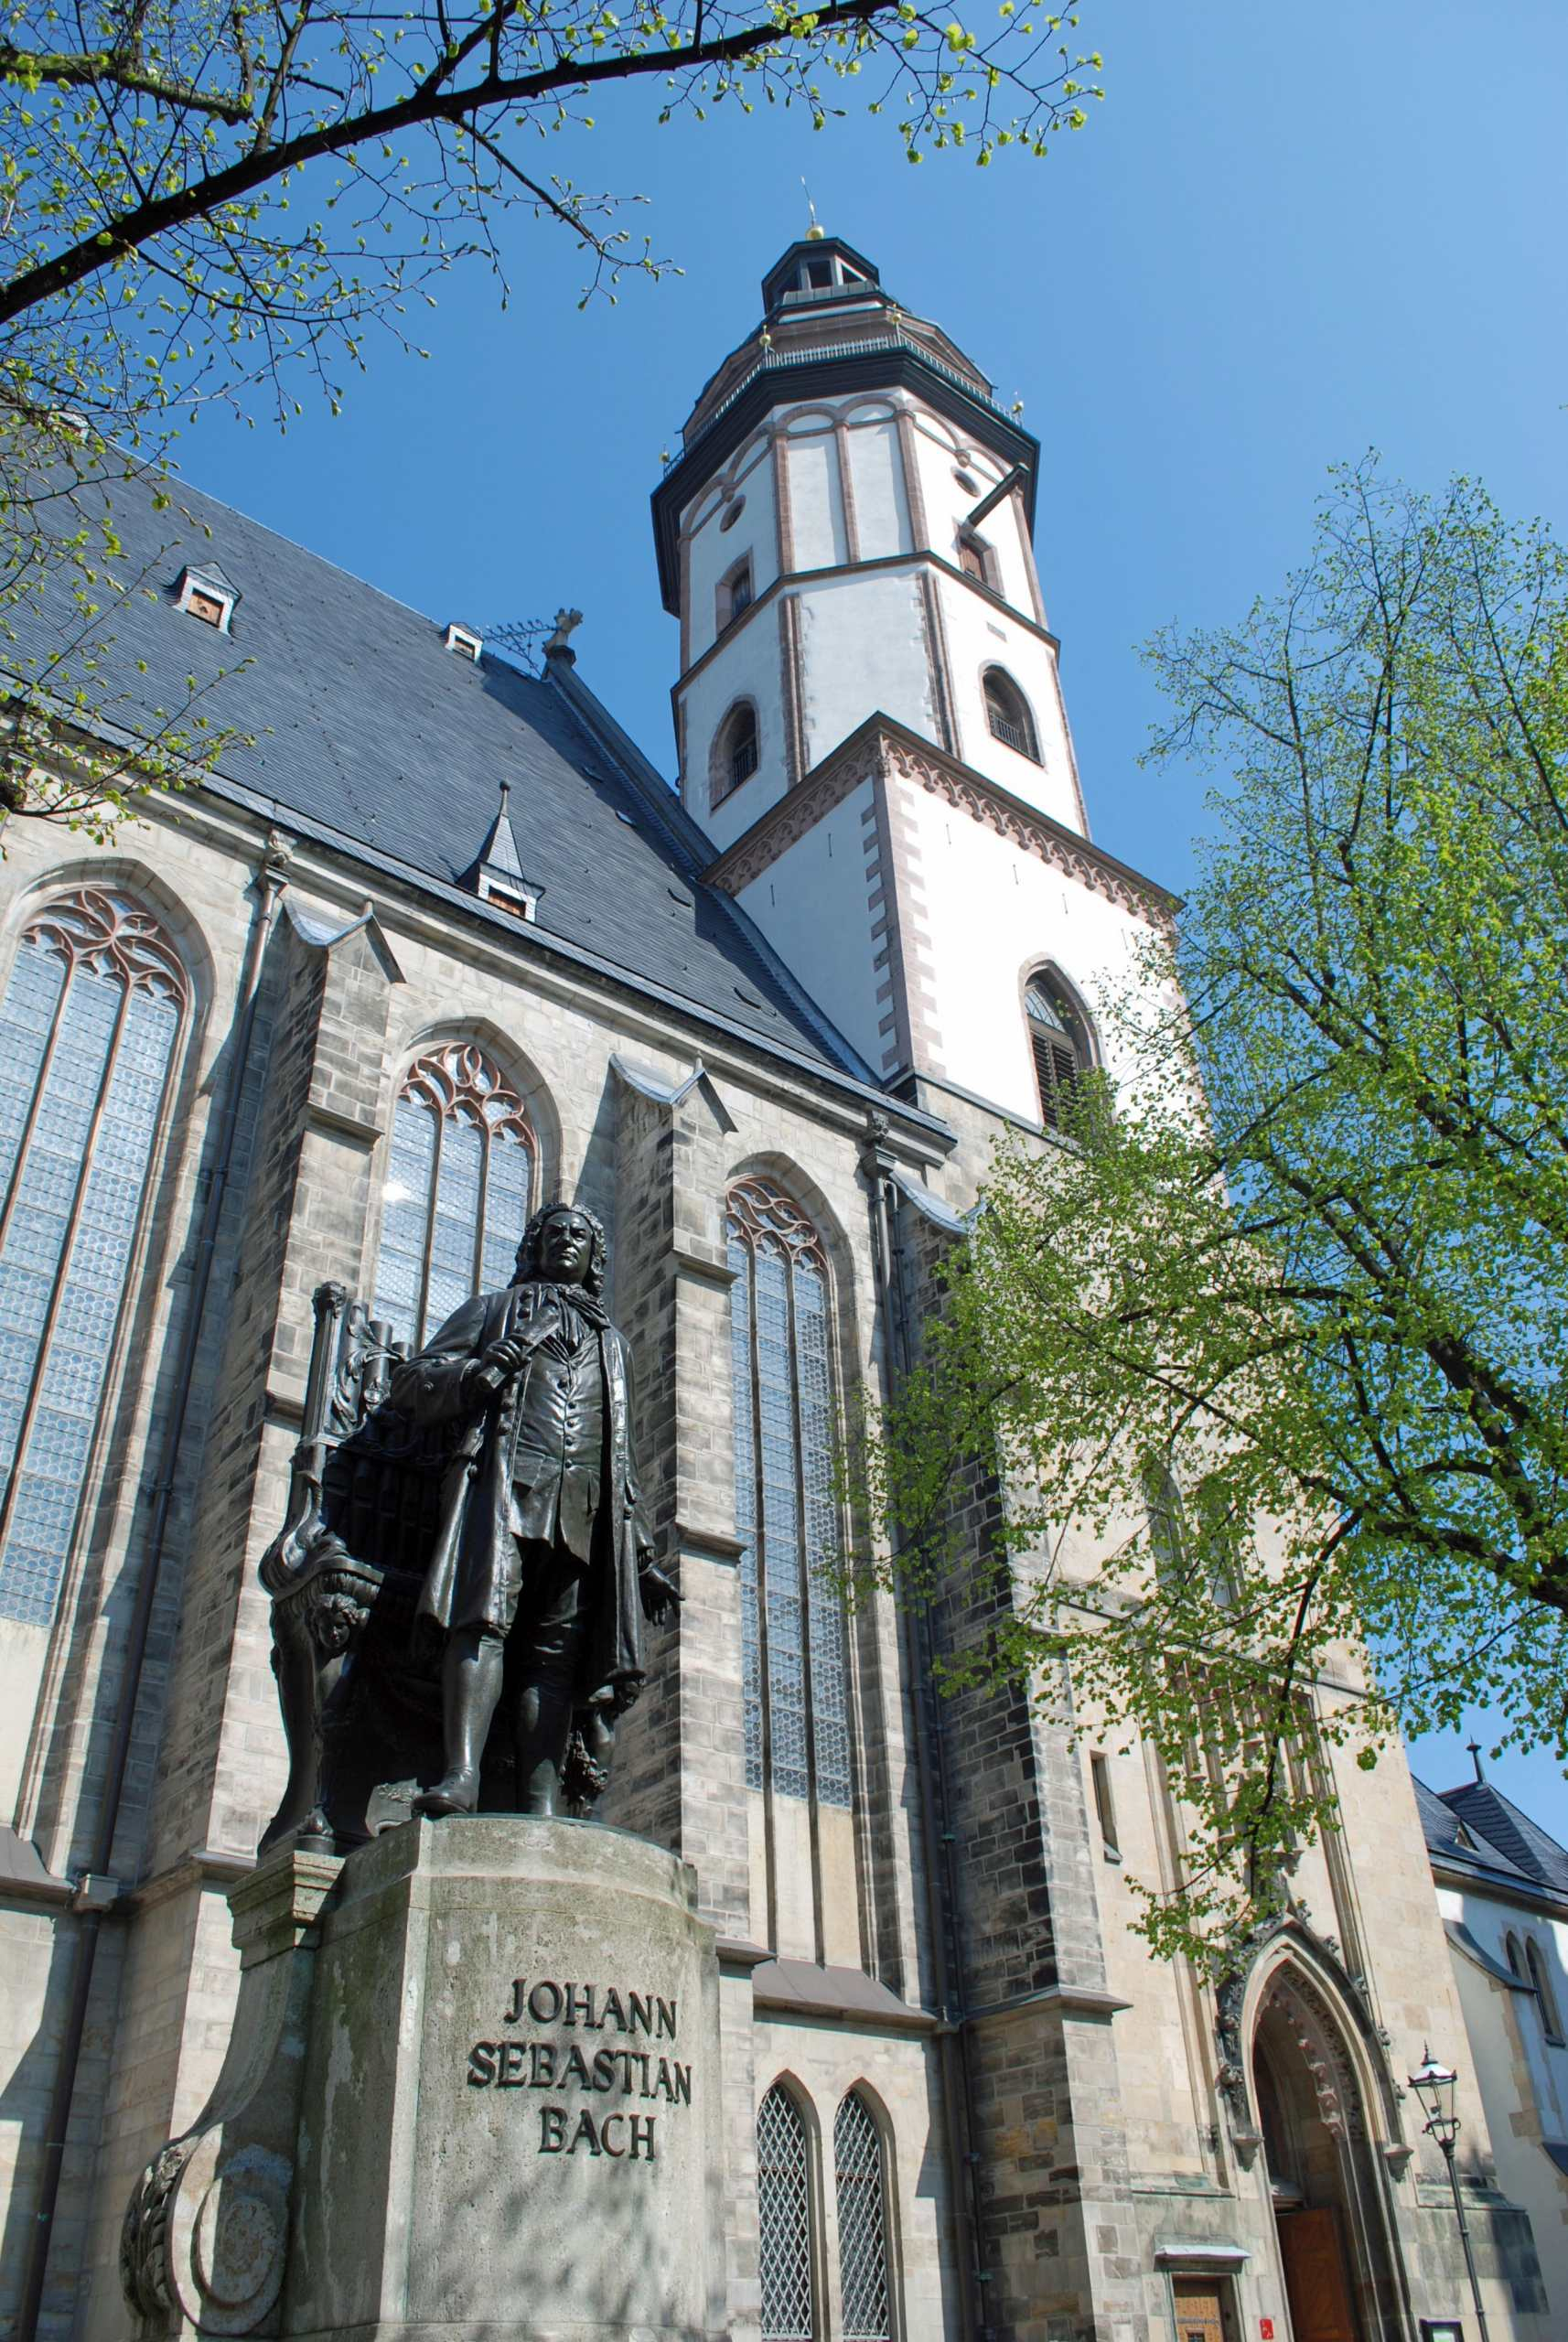 Bach-Denkmal-Thomaskirche_Andreas-Schmidt_leipzig.travel